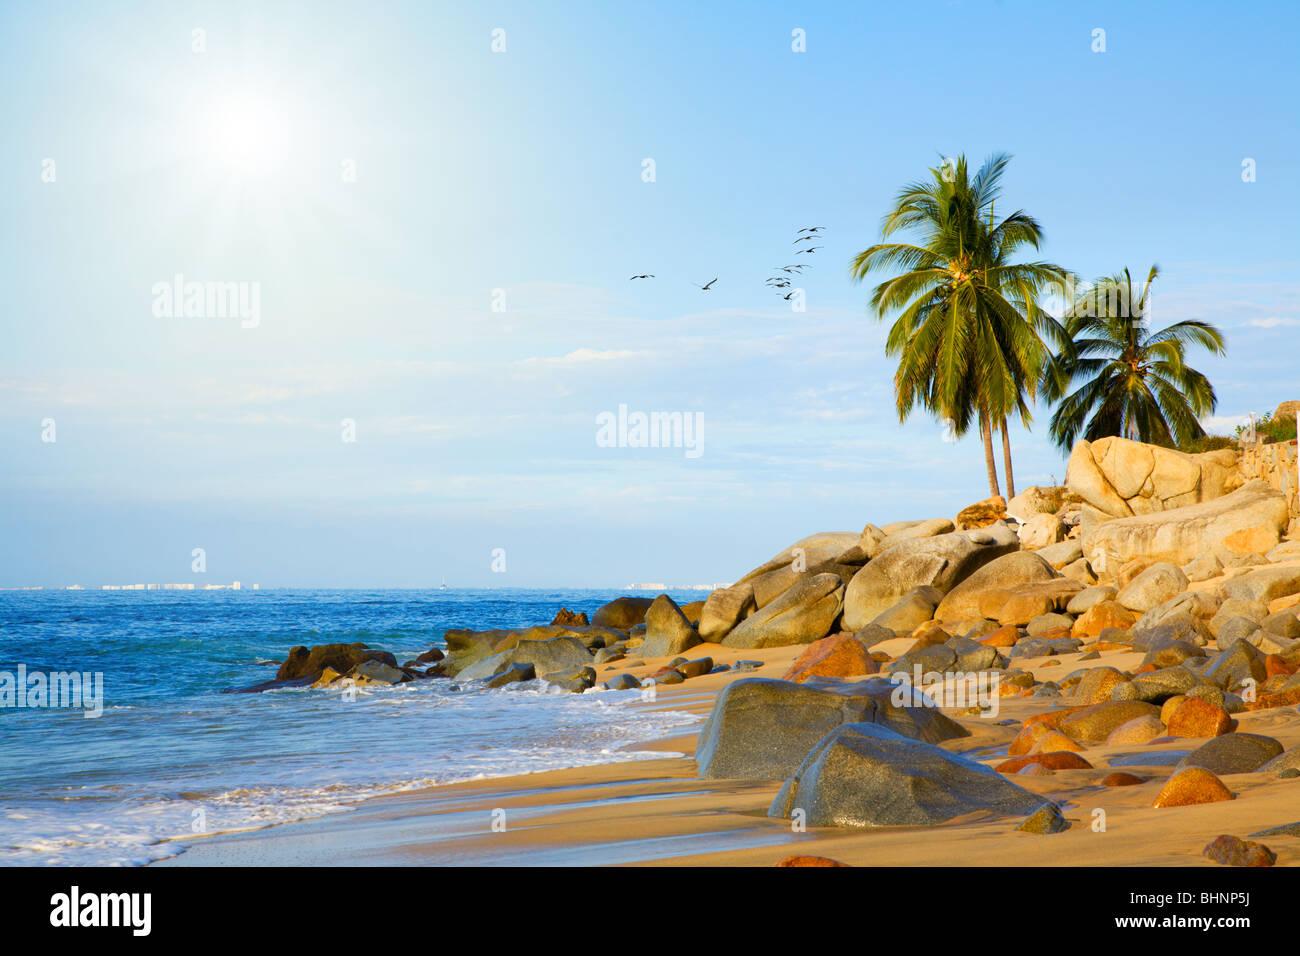 Tropical beach - Stock Image